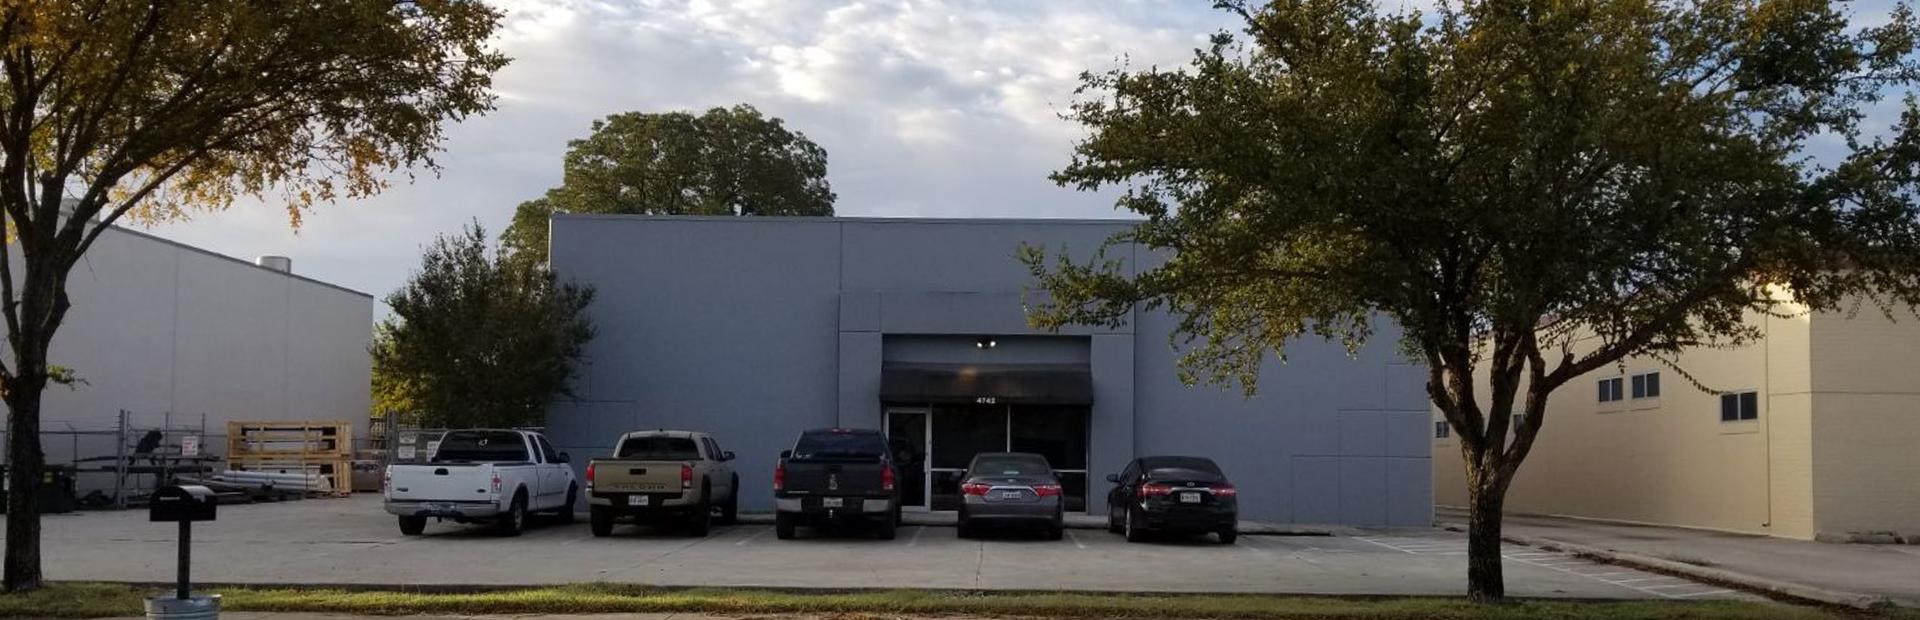 Johnson Equipment Company - San Antonio, Texas